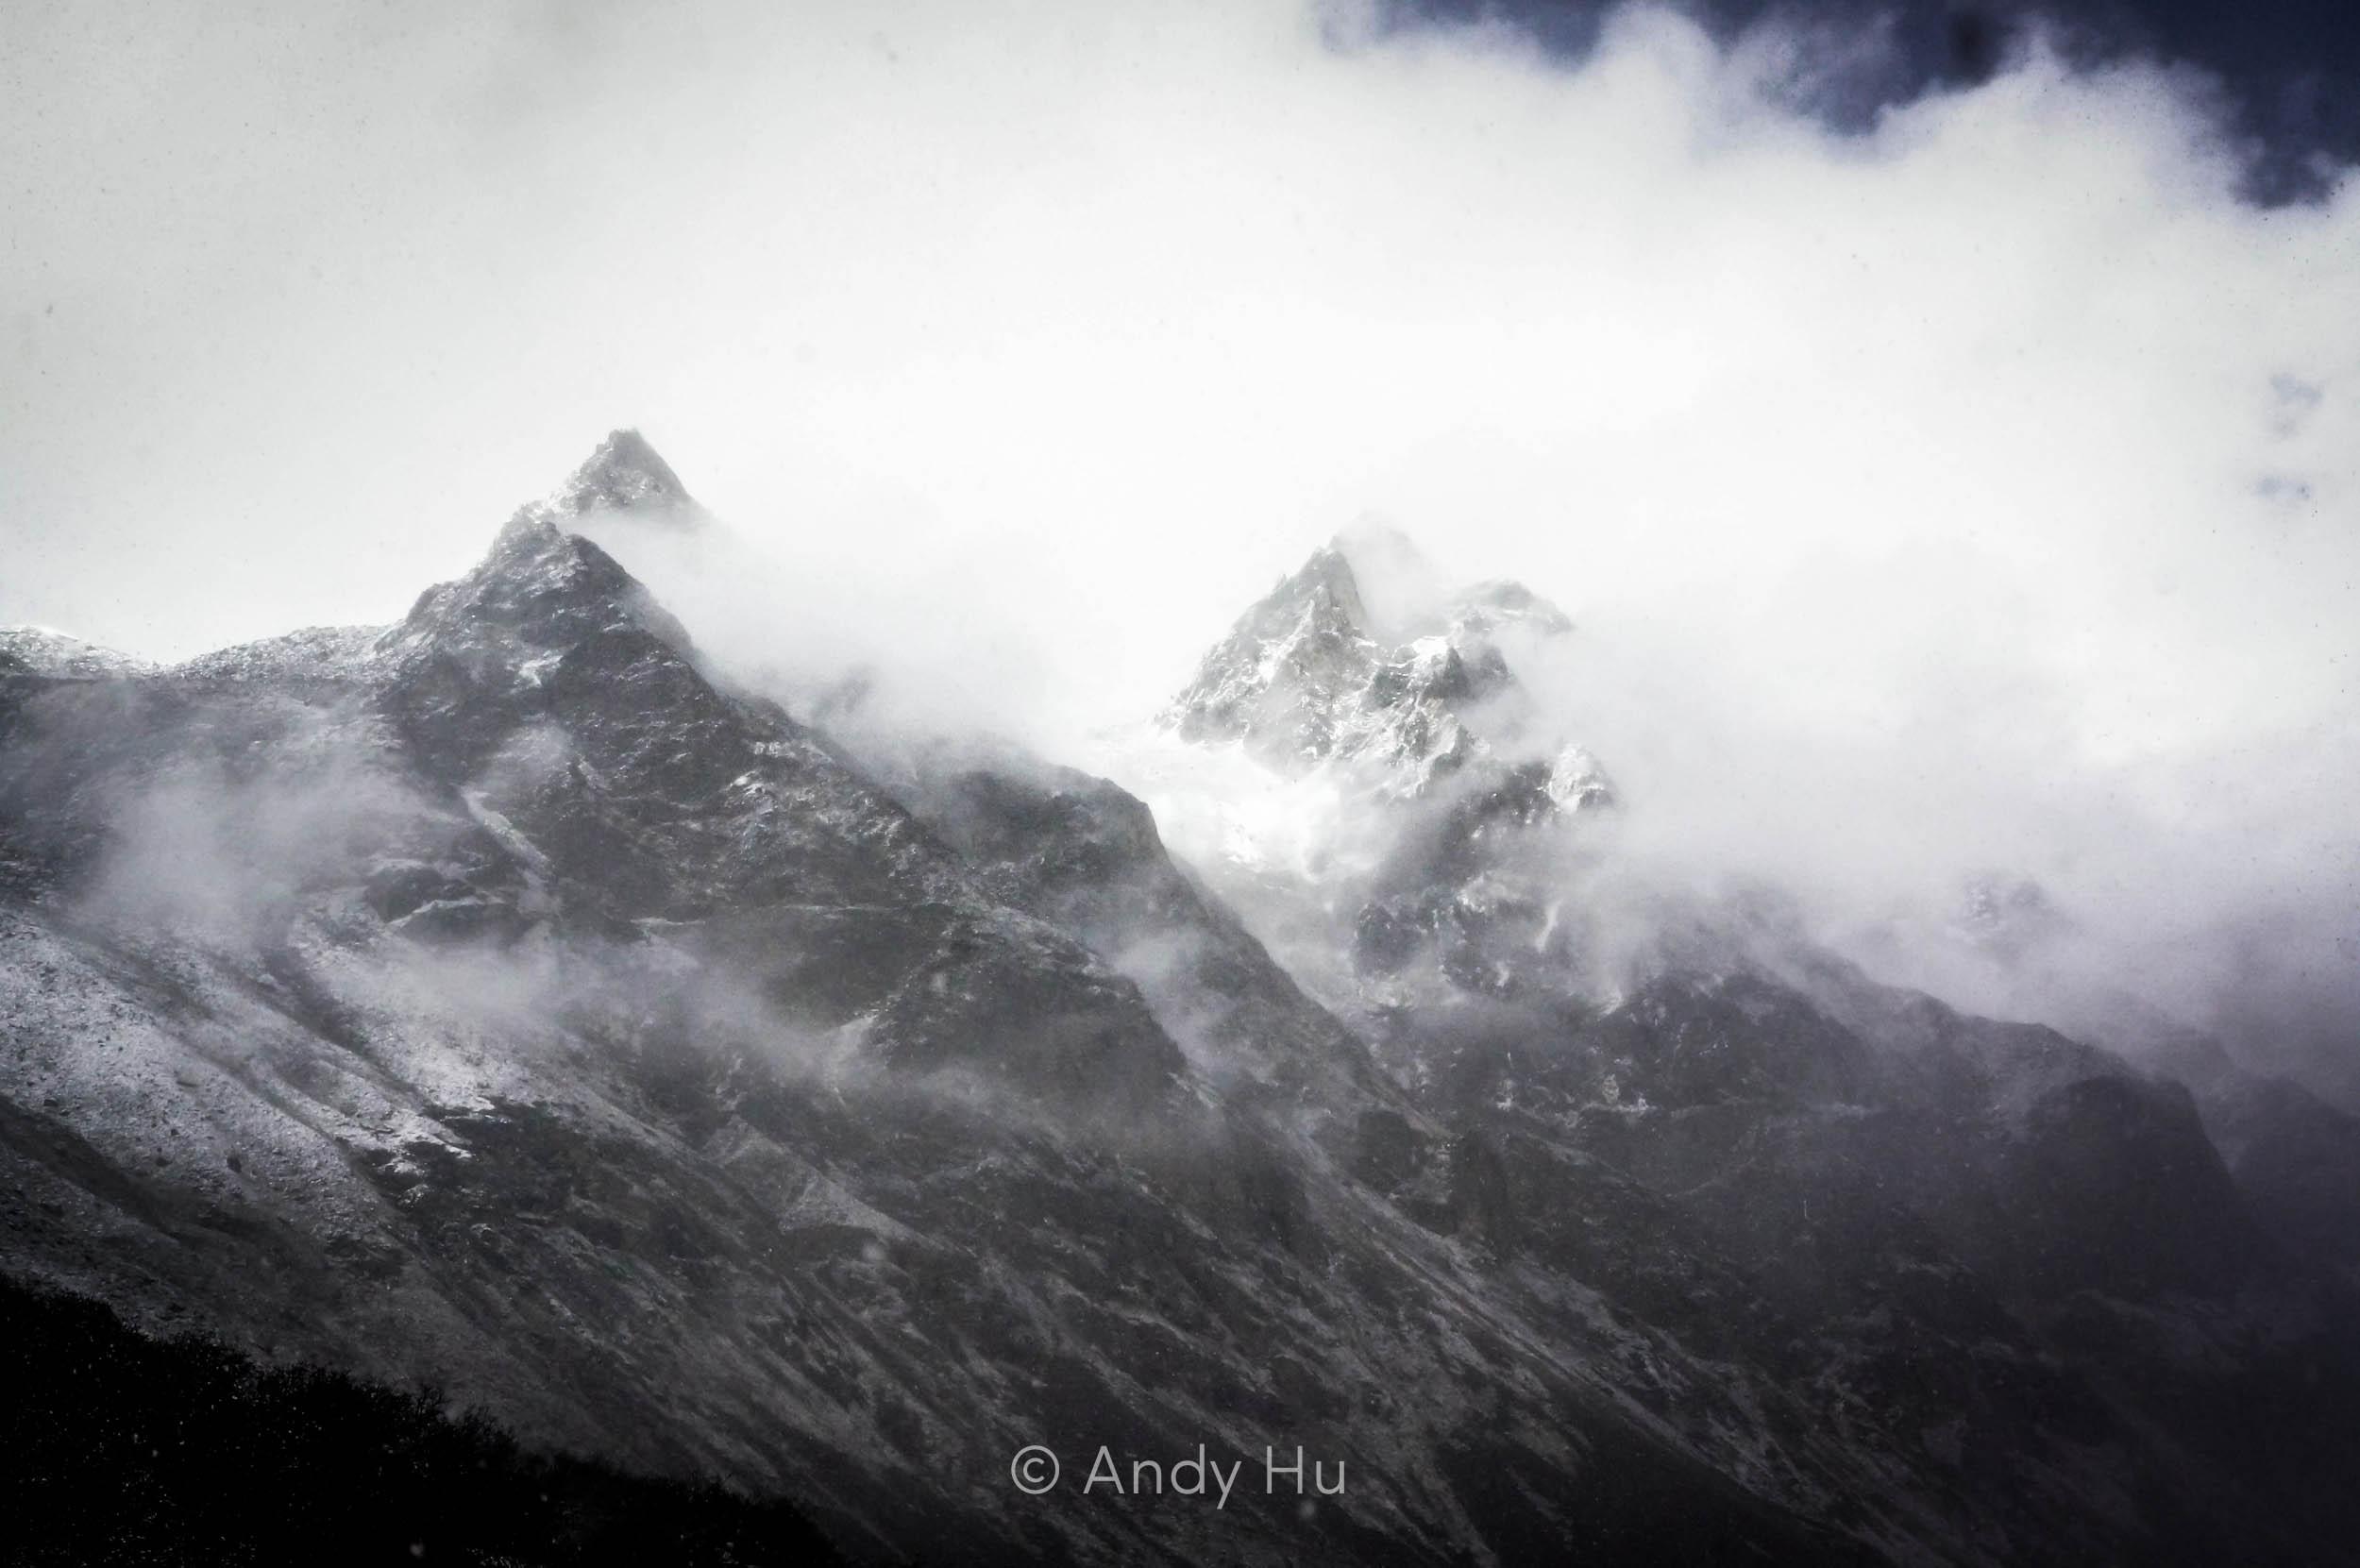 Mountains veiled by clouds, Mt. Gongga Trek